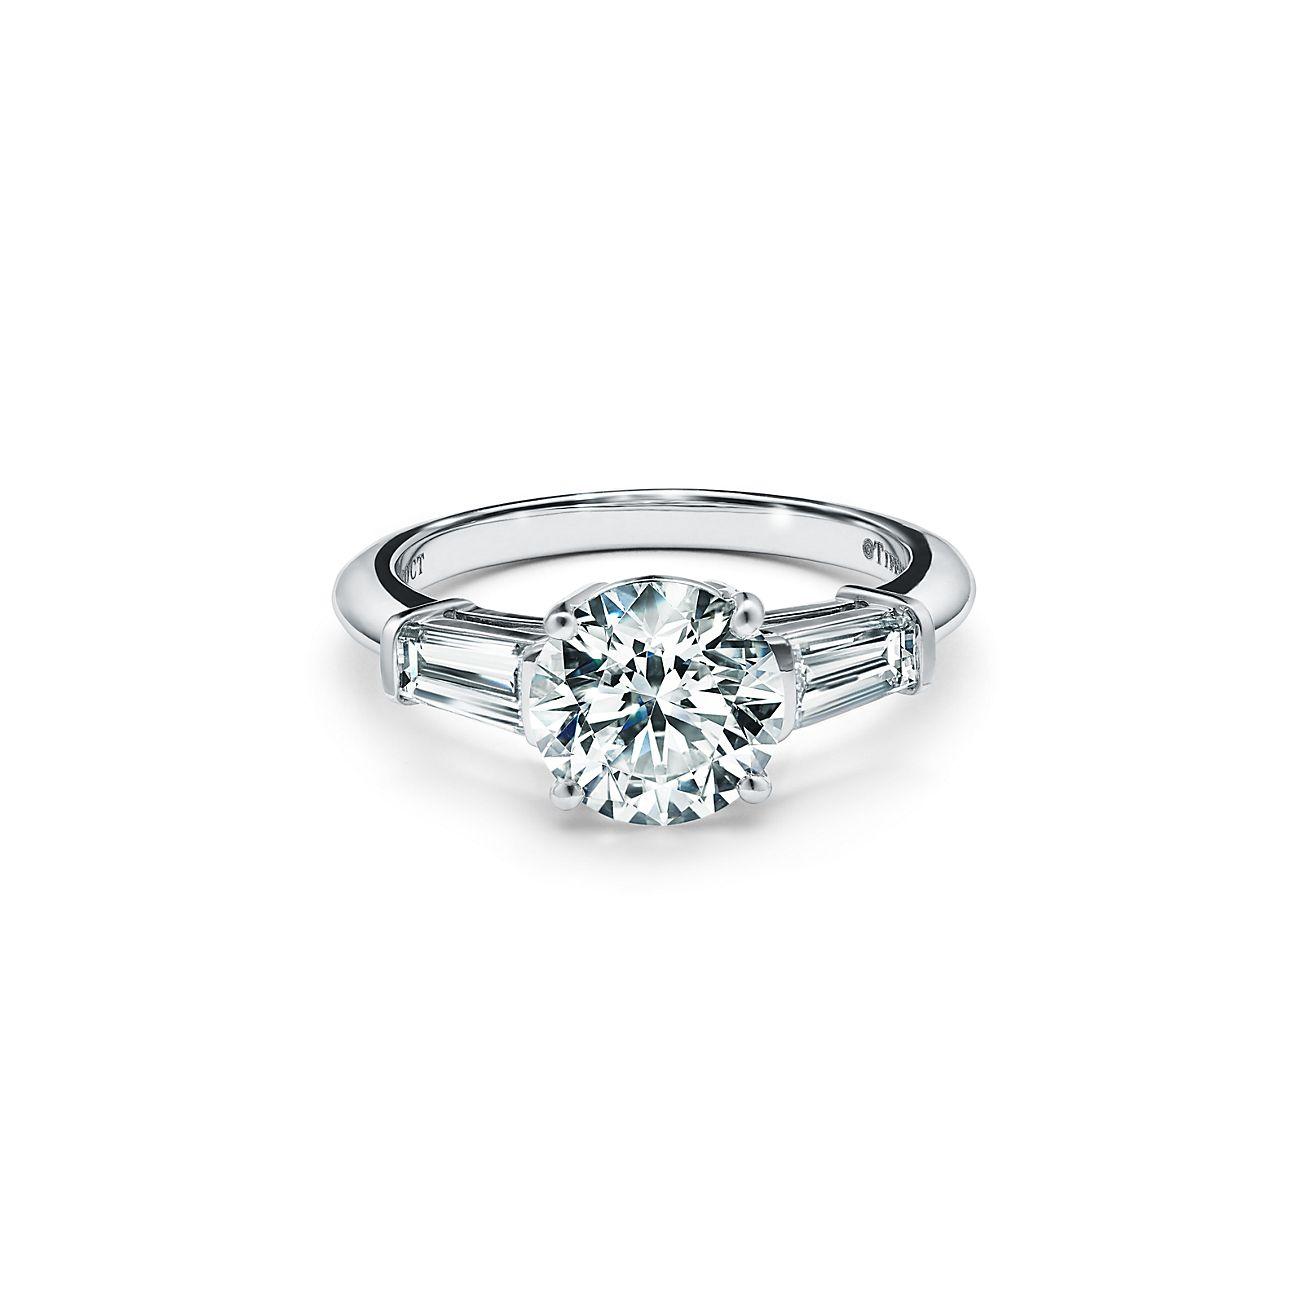 Tiffany Three Stone Engagement Ring